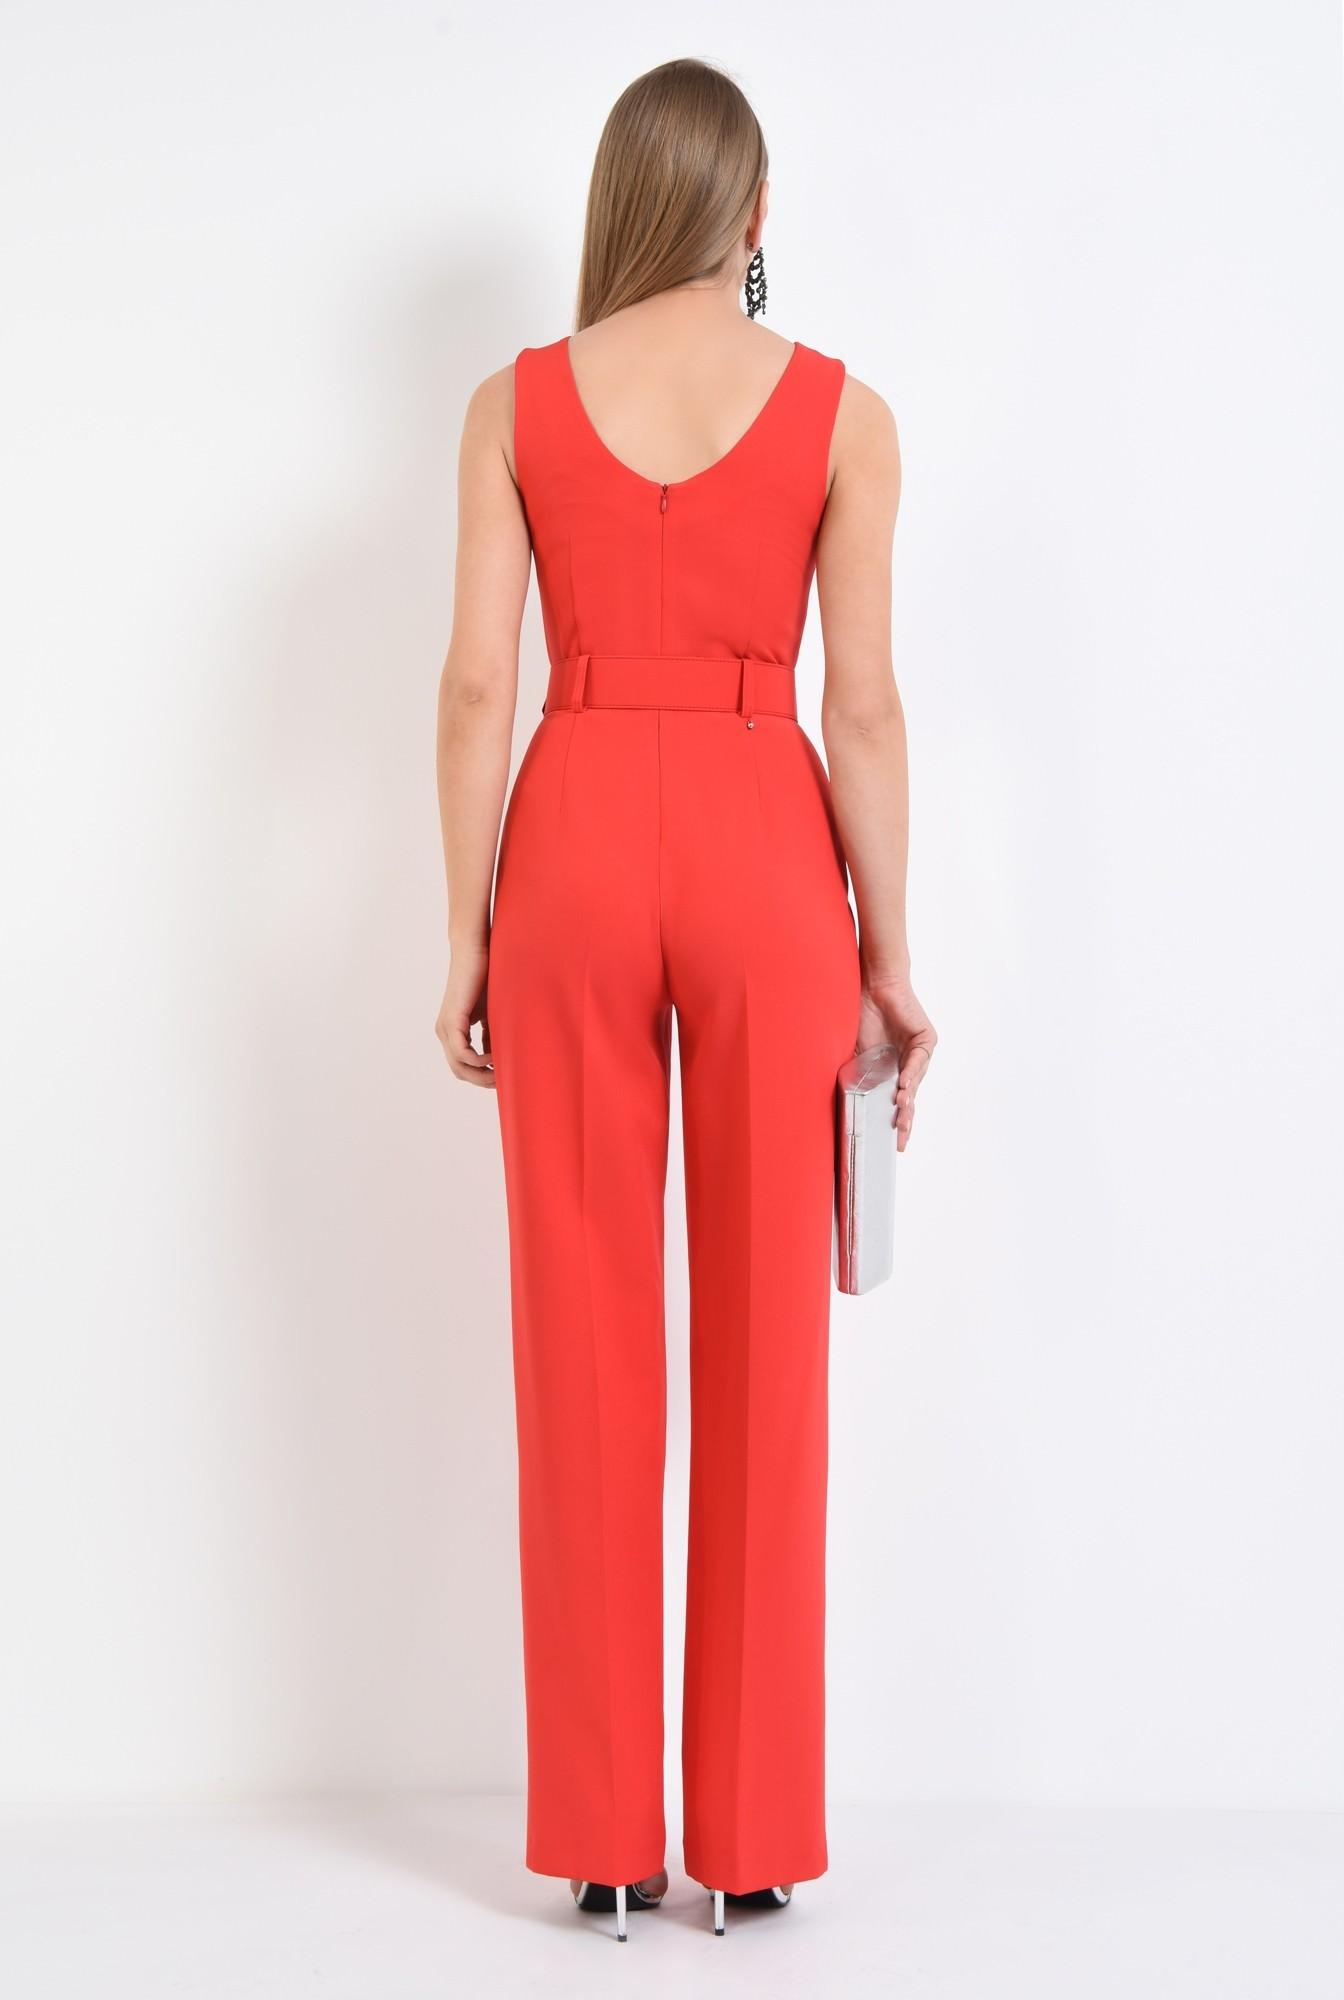 1 - salopeta eleganta rosie, curea lata, pantaloni la dunga